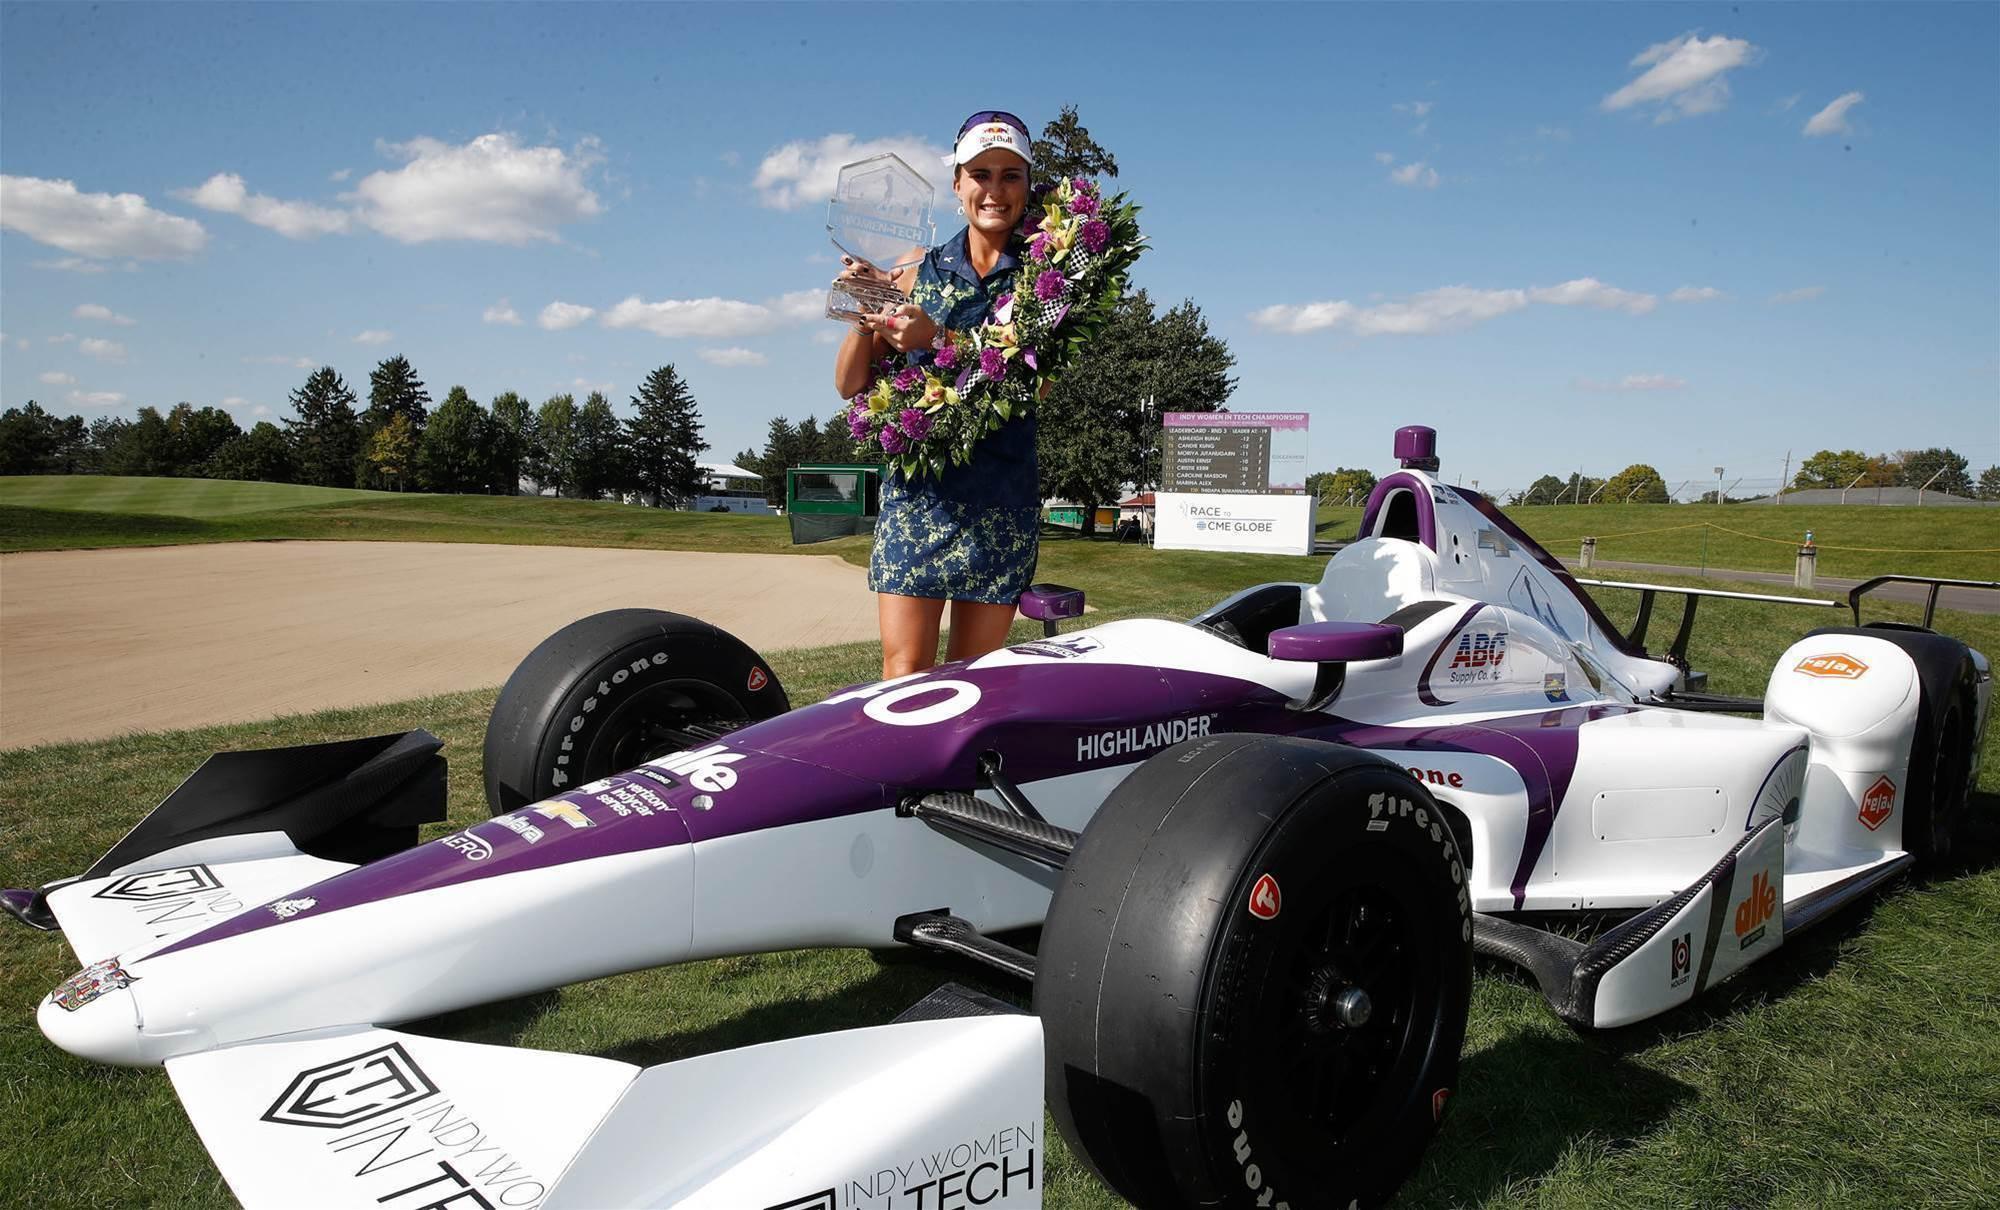 LPGA TOUR: Lexi lands KO blow in Indianapolis